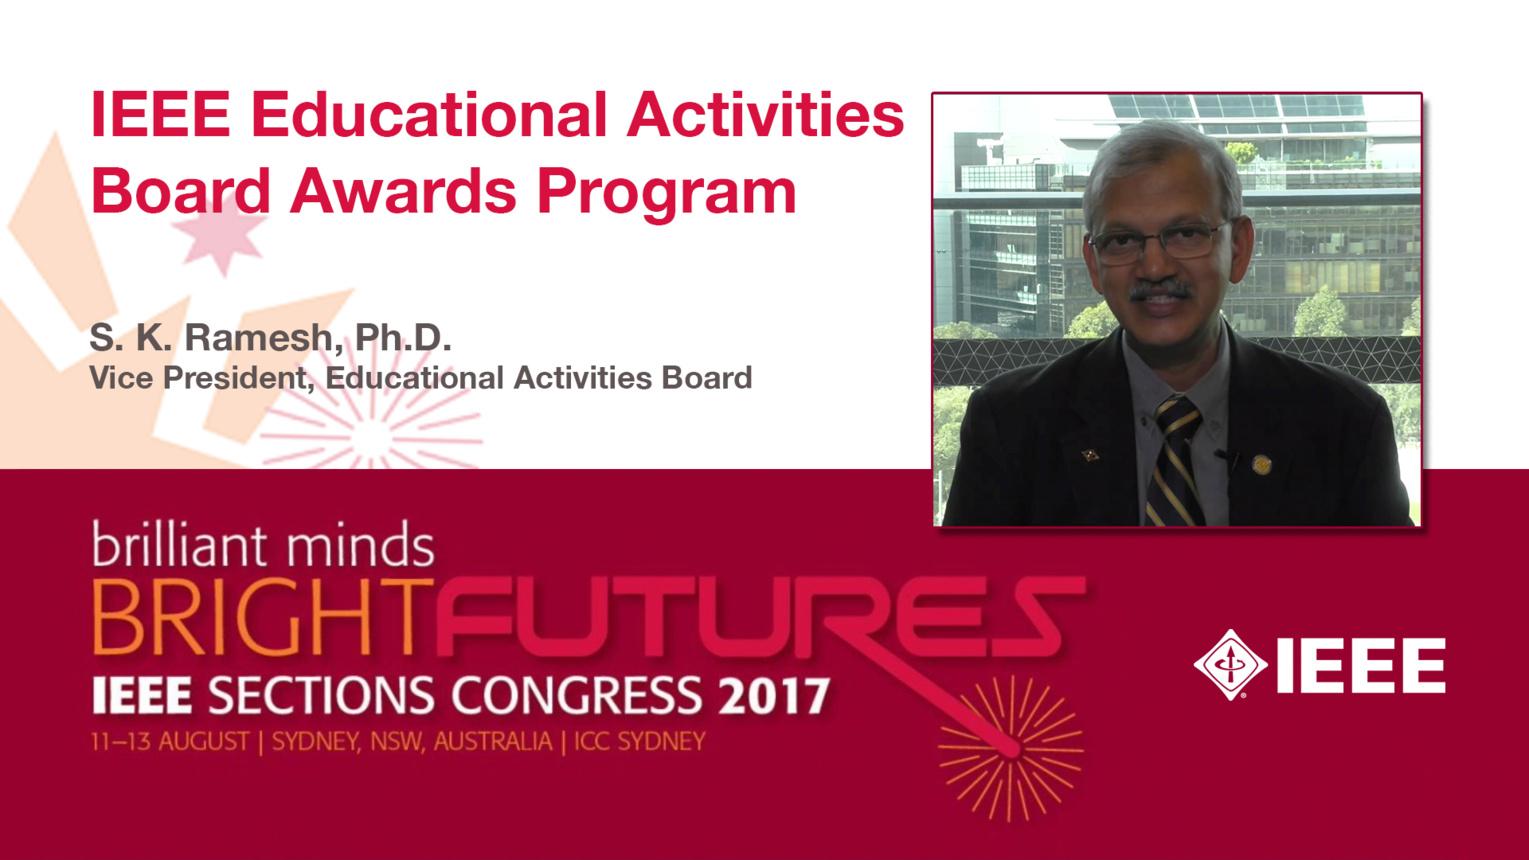 S.K. Ramesh: IEEE Educational Activities Board Awards Program - Studio Tech Talks: Sections Congress 2017